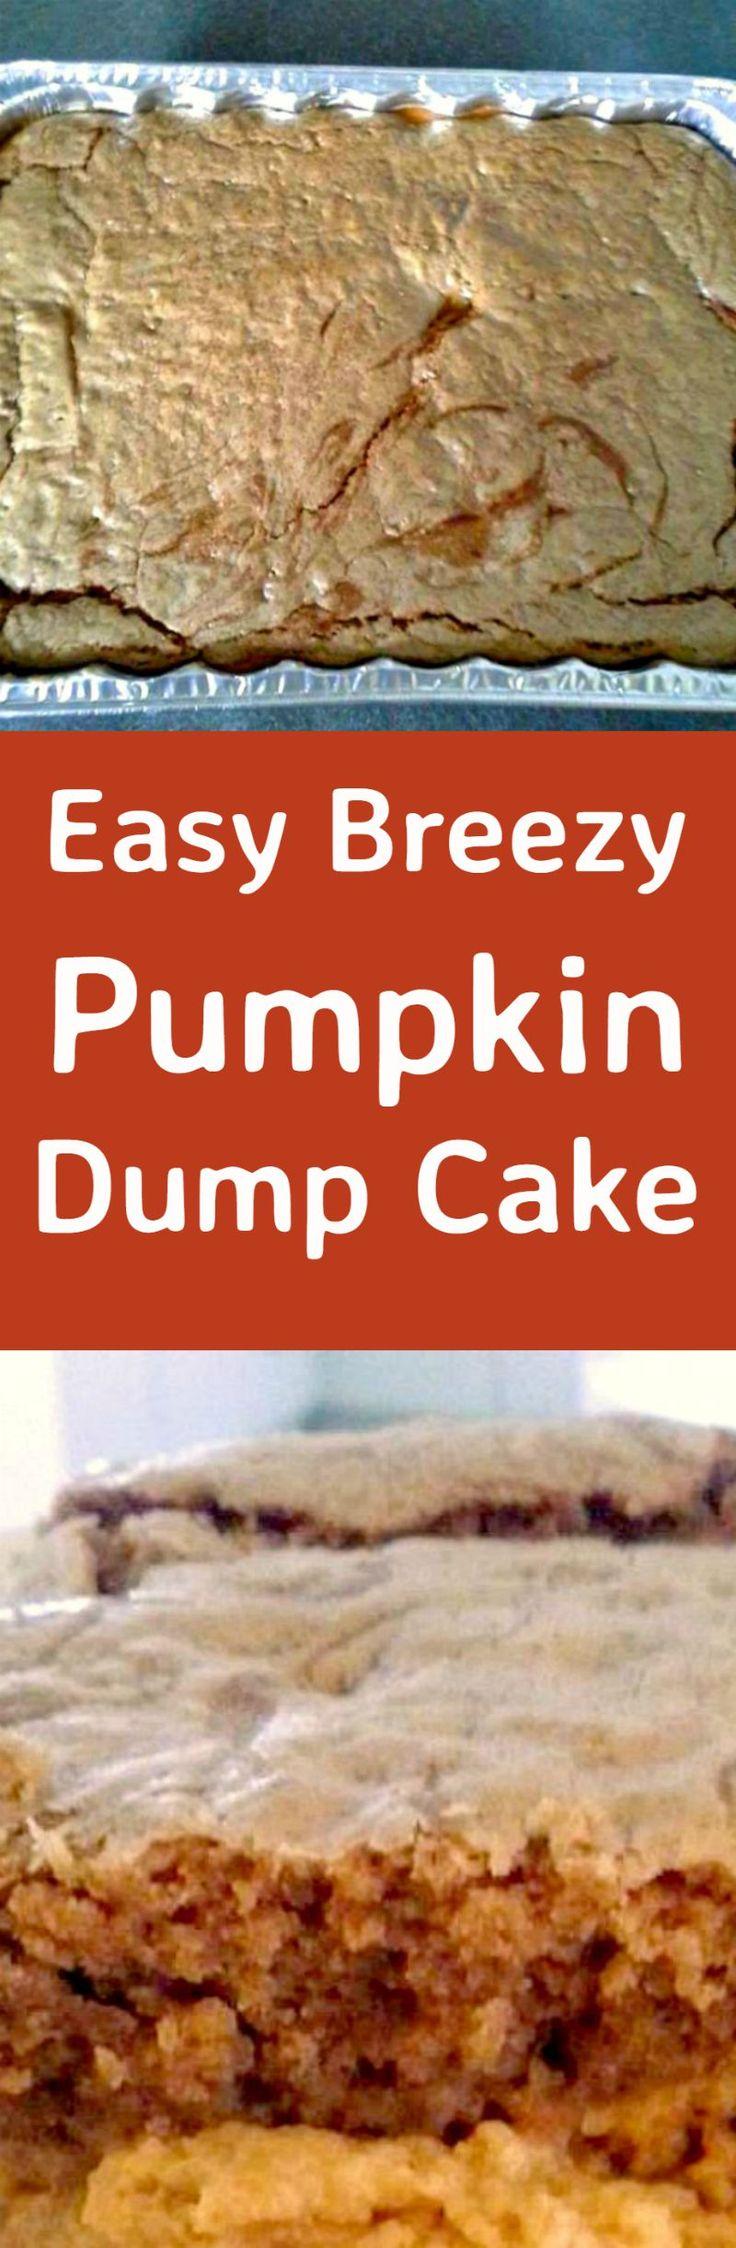 Easy Breezy Pumpkin Dump Cake - Recipes for regular and lite versions. You choose! | Lovefoodies.com